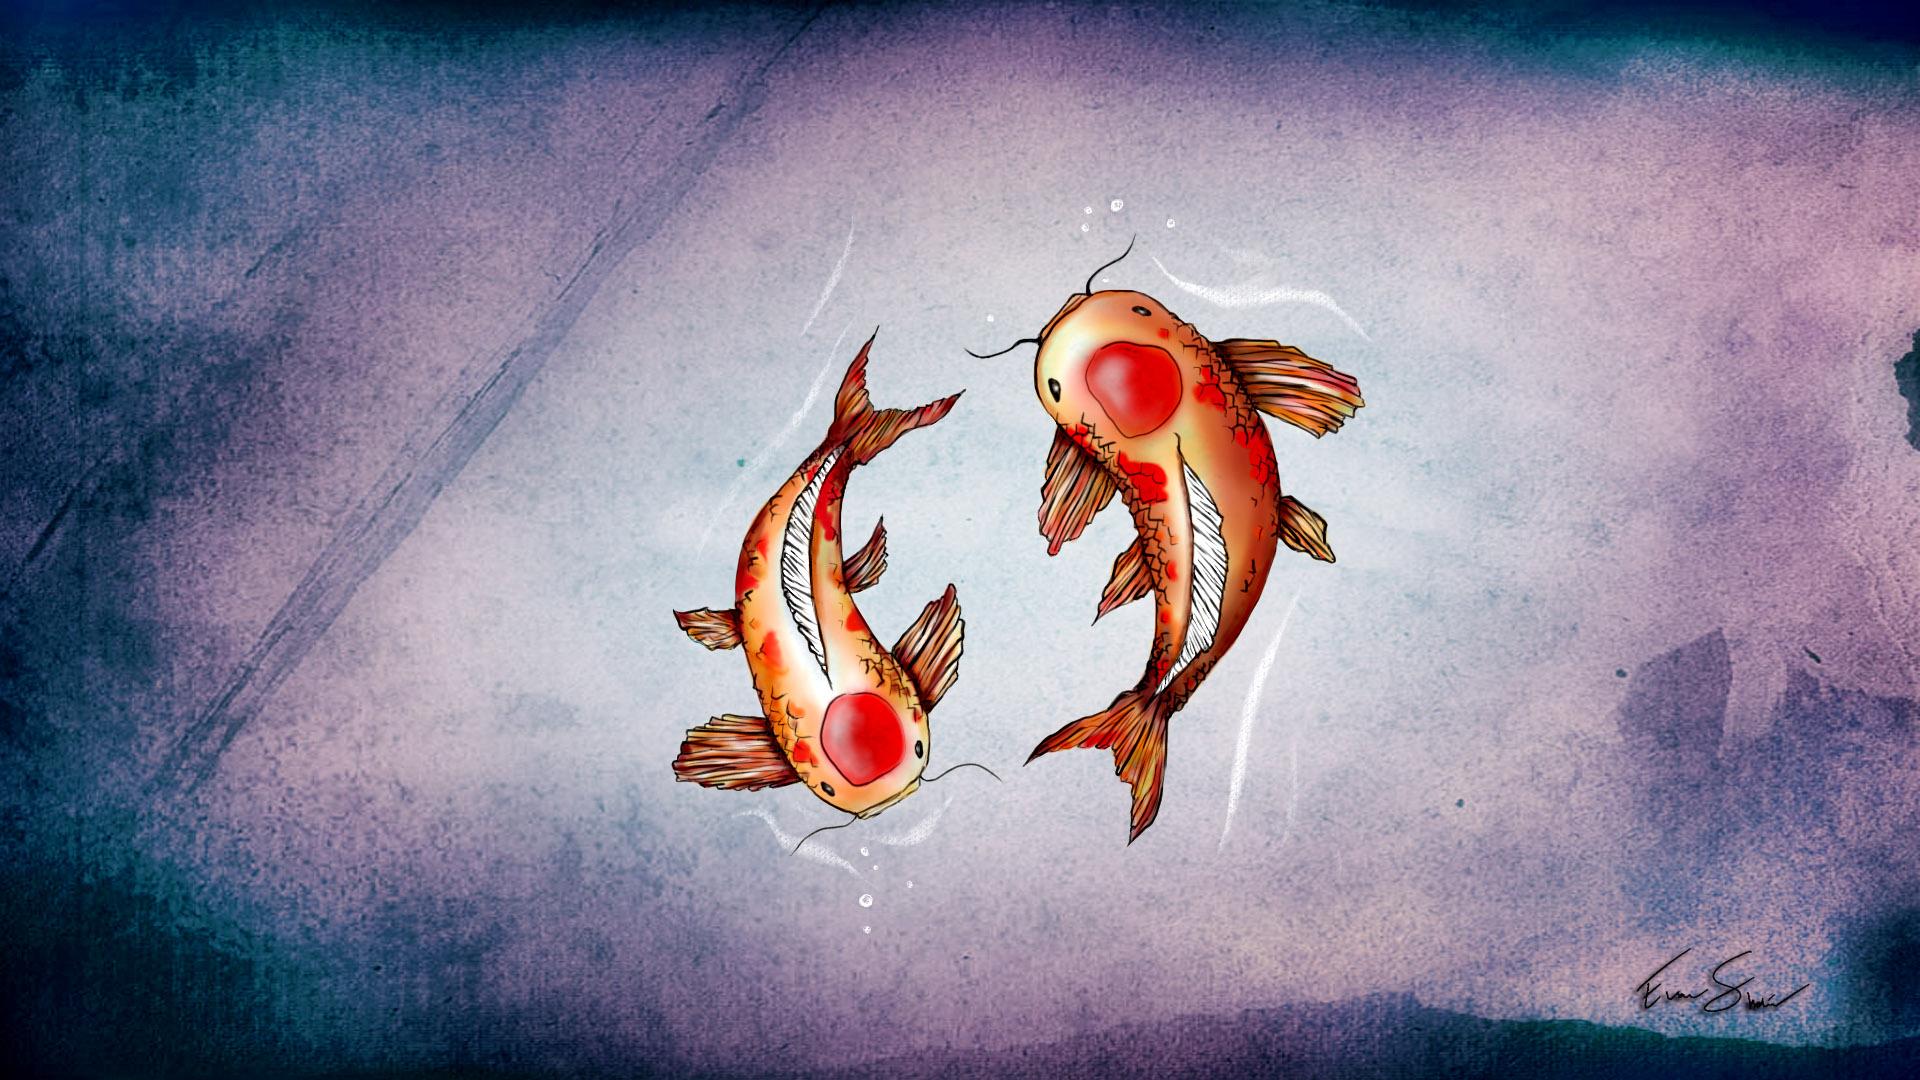 Hd Koi Fish Wallpaper , HD Wallpaper & Backgrounds